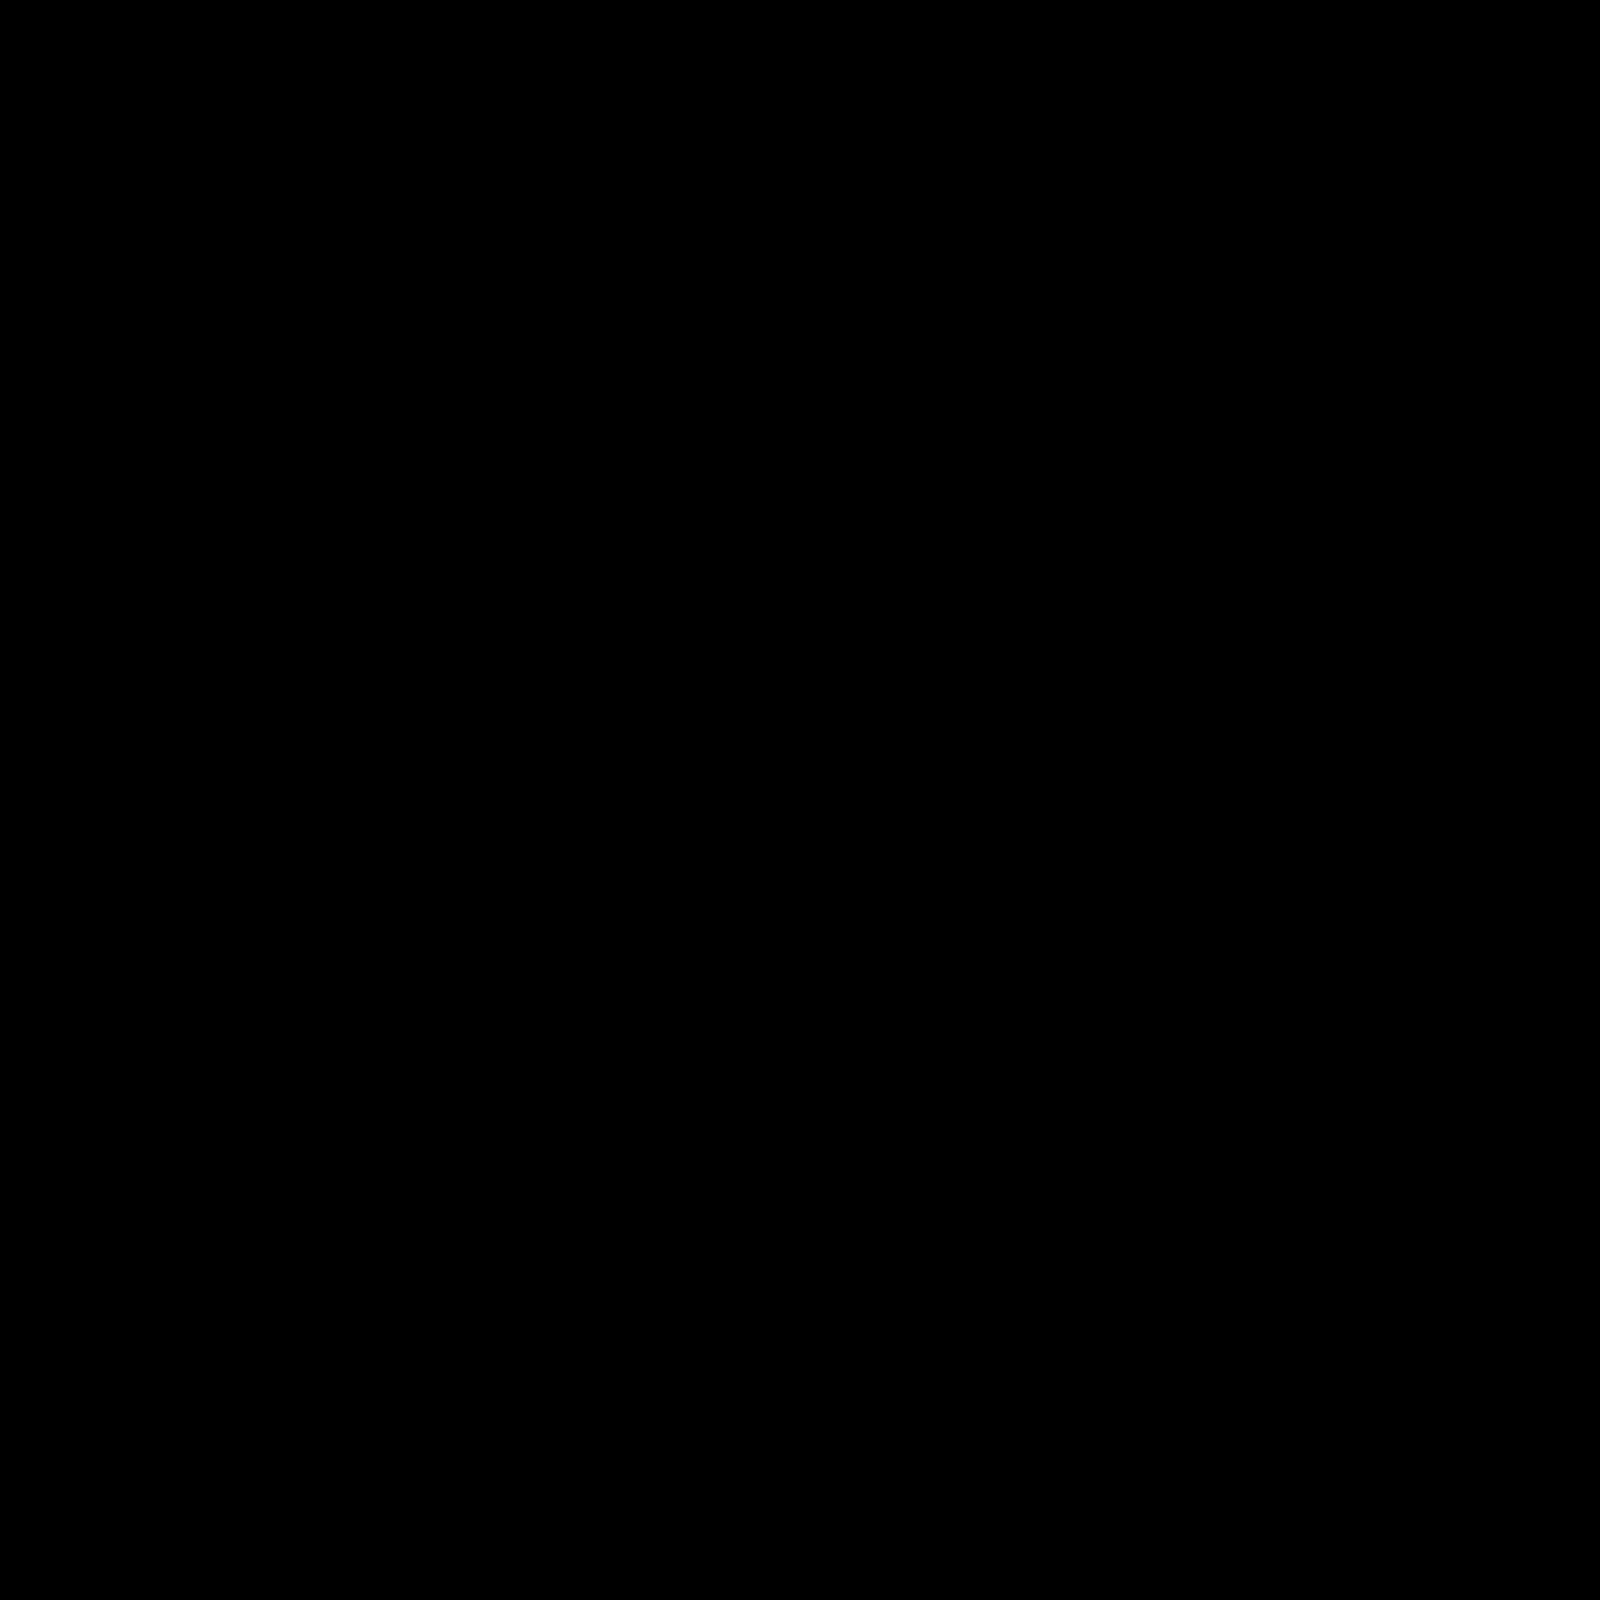 Turkey Map icon